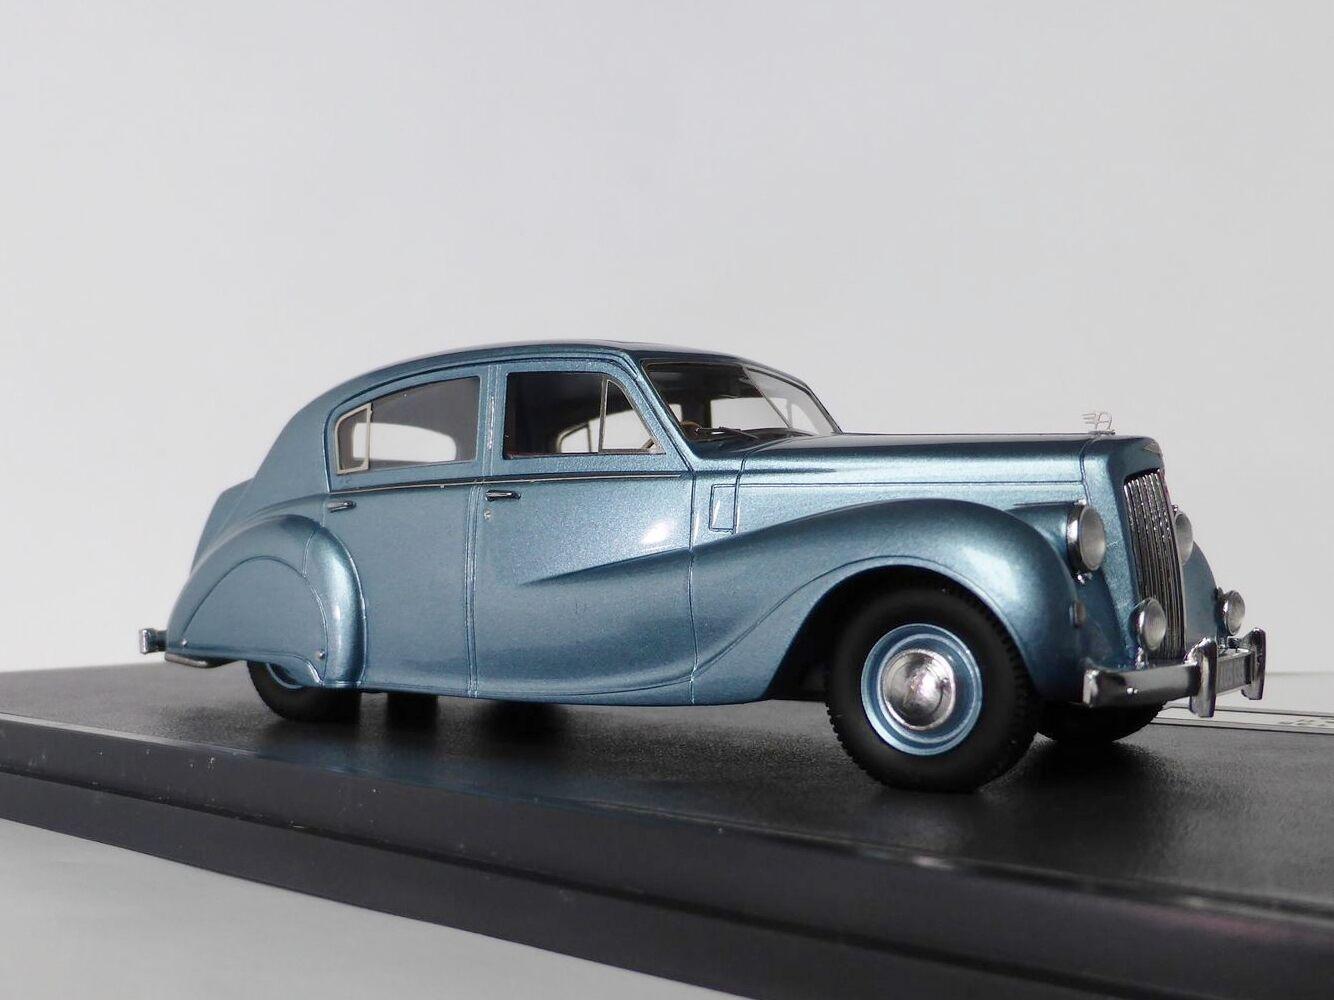 Austin A135 Princess II DS3 1950 1/43 Matrice Mx42101-021 Mx42101 di Vanden Plas